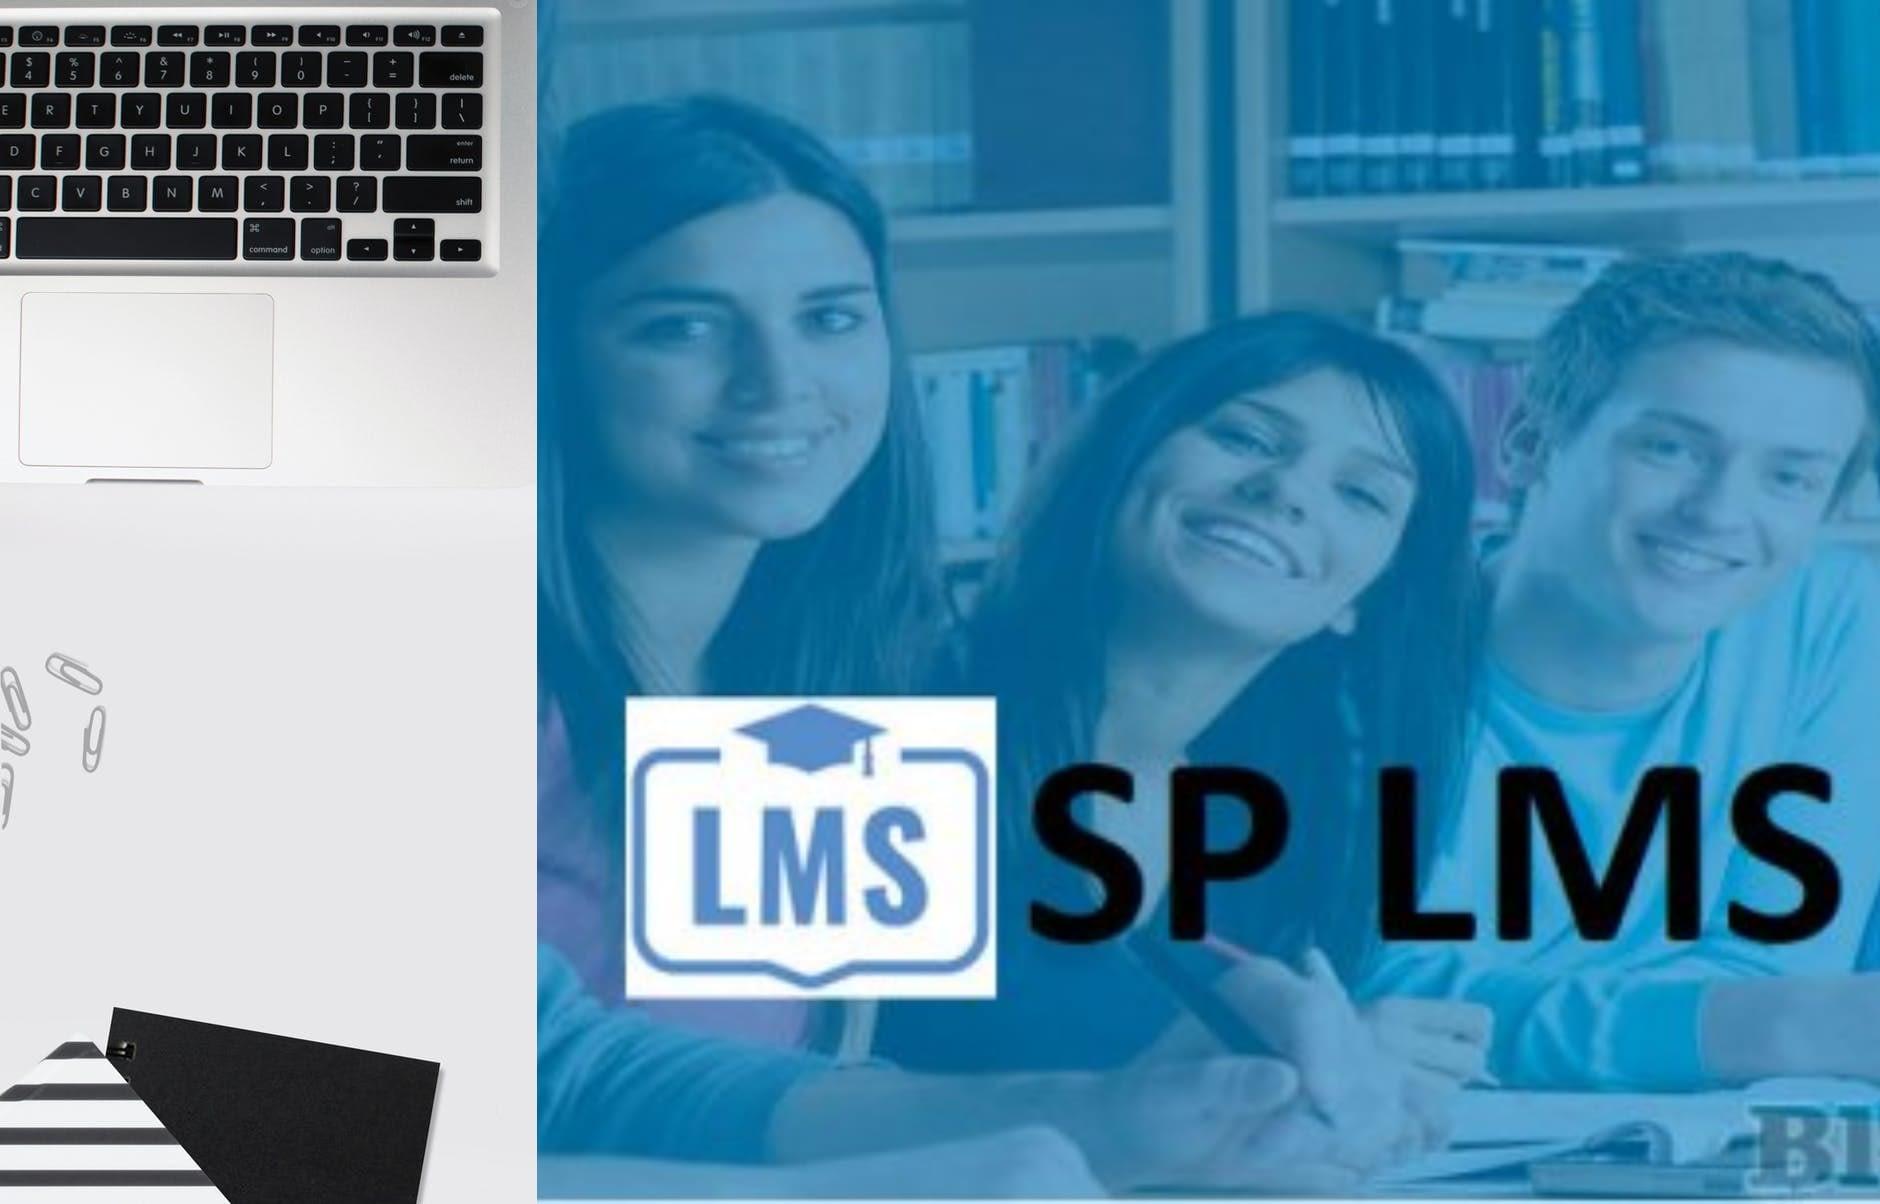 7th u SP LMS 2